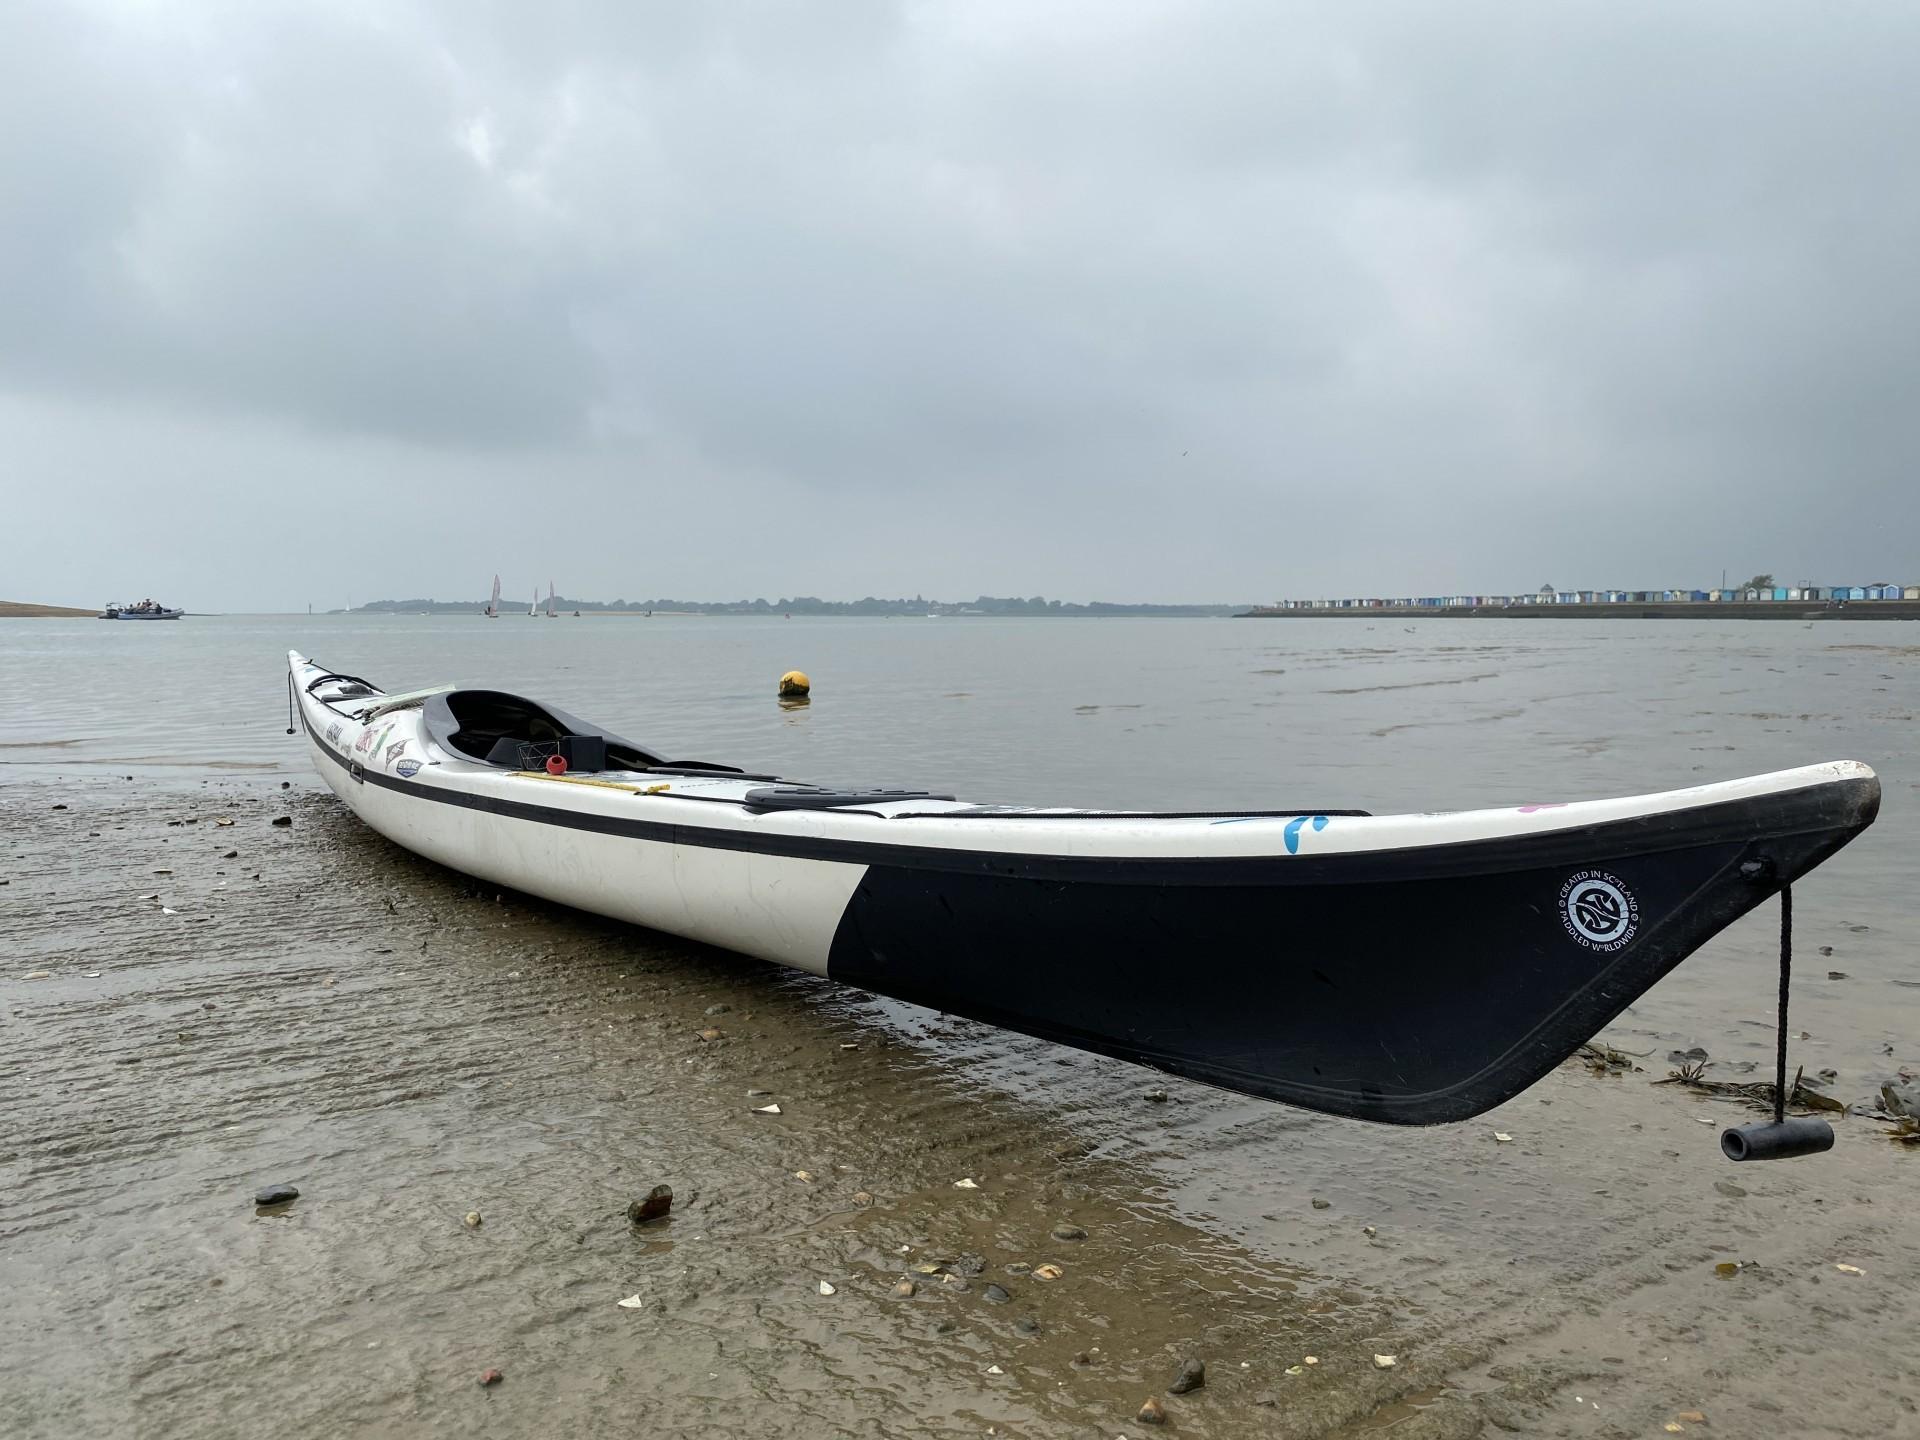 NDK Explorer HV Expedition Sea Kayak on a beach